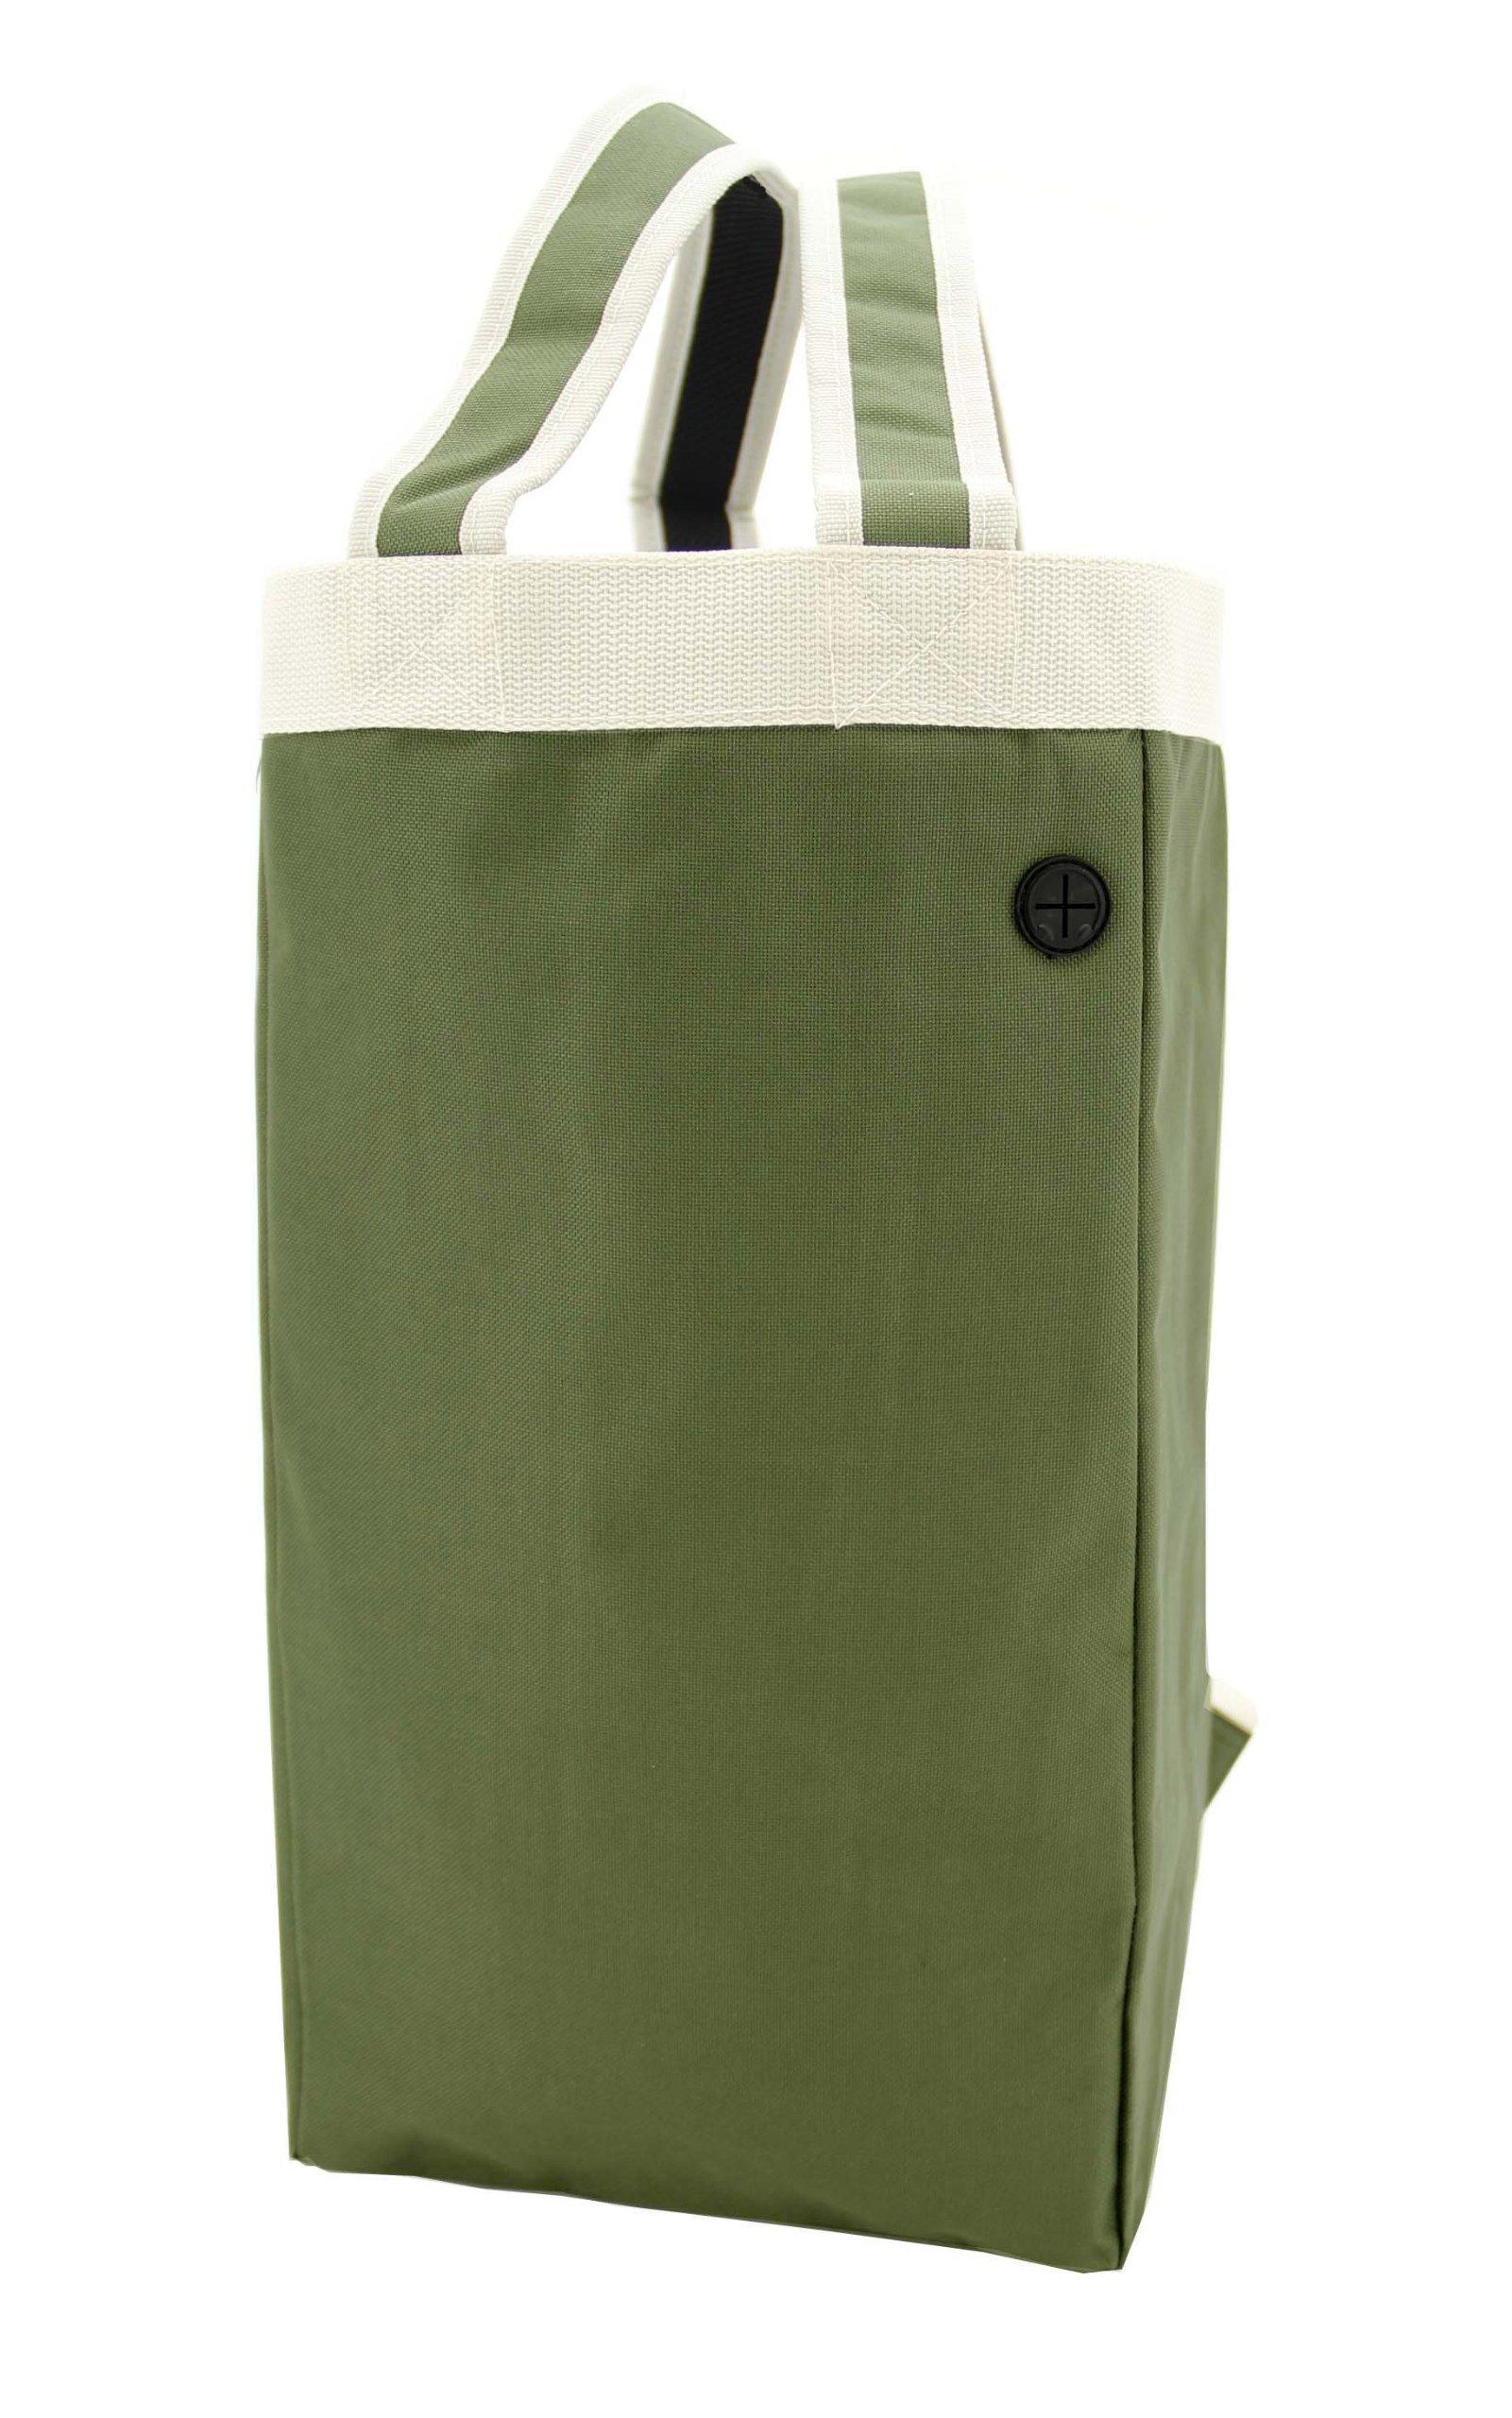 Crossover Tote&Backpack/ Shoulder Tote Bag/ Multifunction Backpack, Froest Green